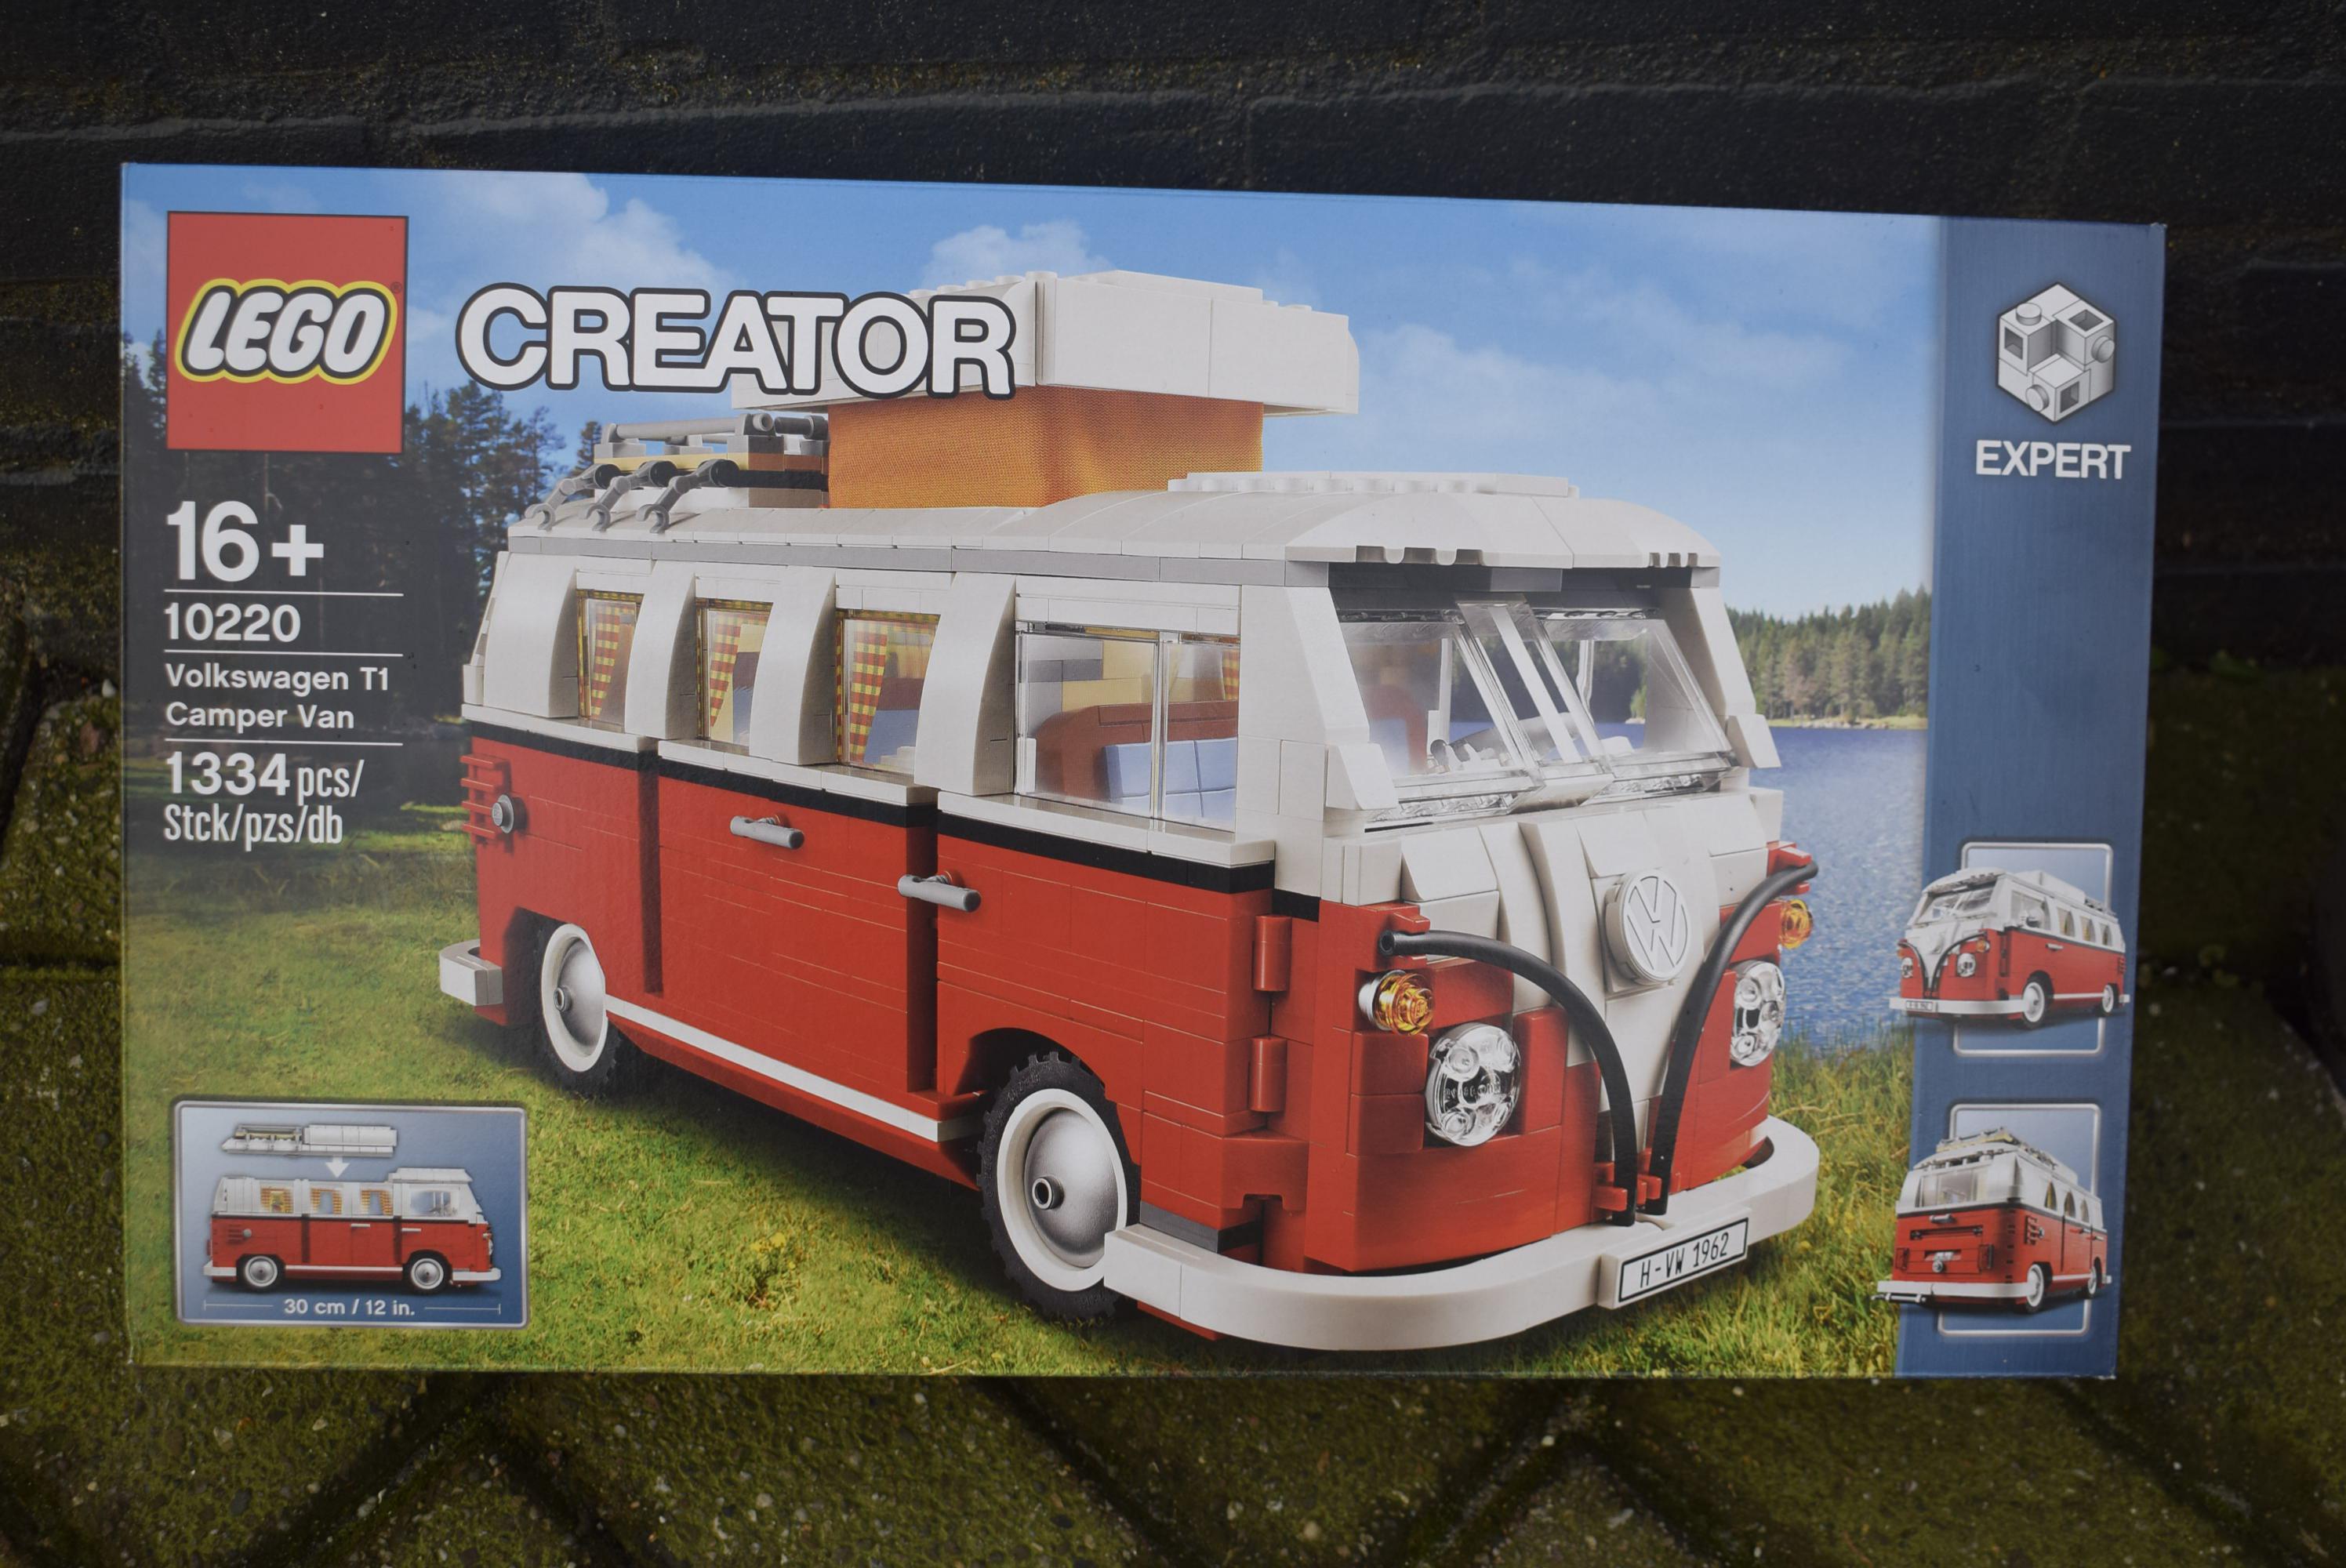 evam classic lego volkswagen bus creator 1334 pieces. Black Bedroom Furniture Sets. Home Design Ideas